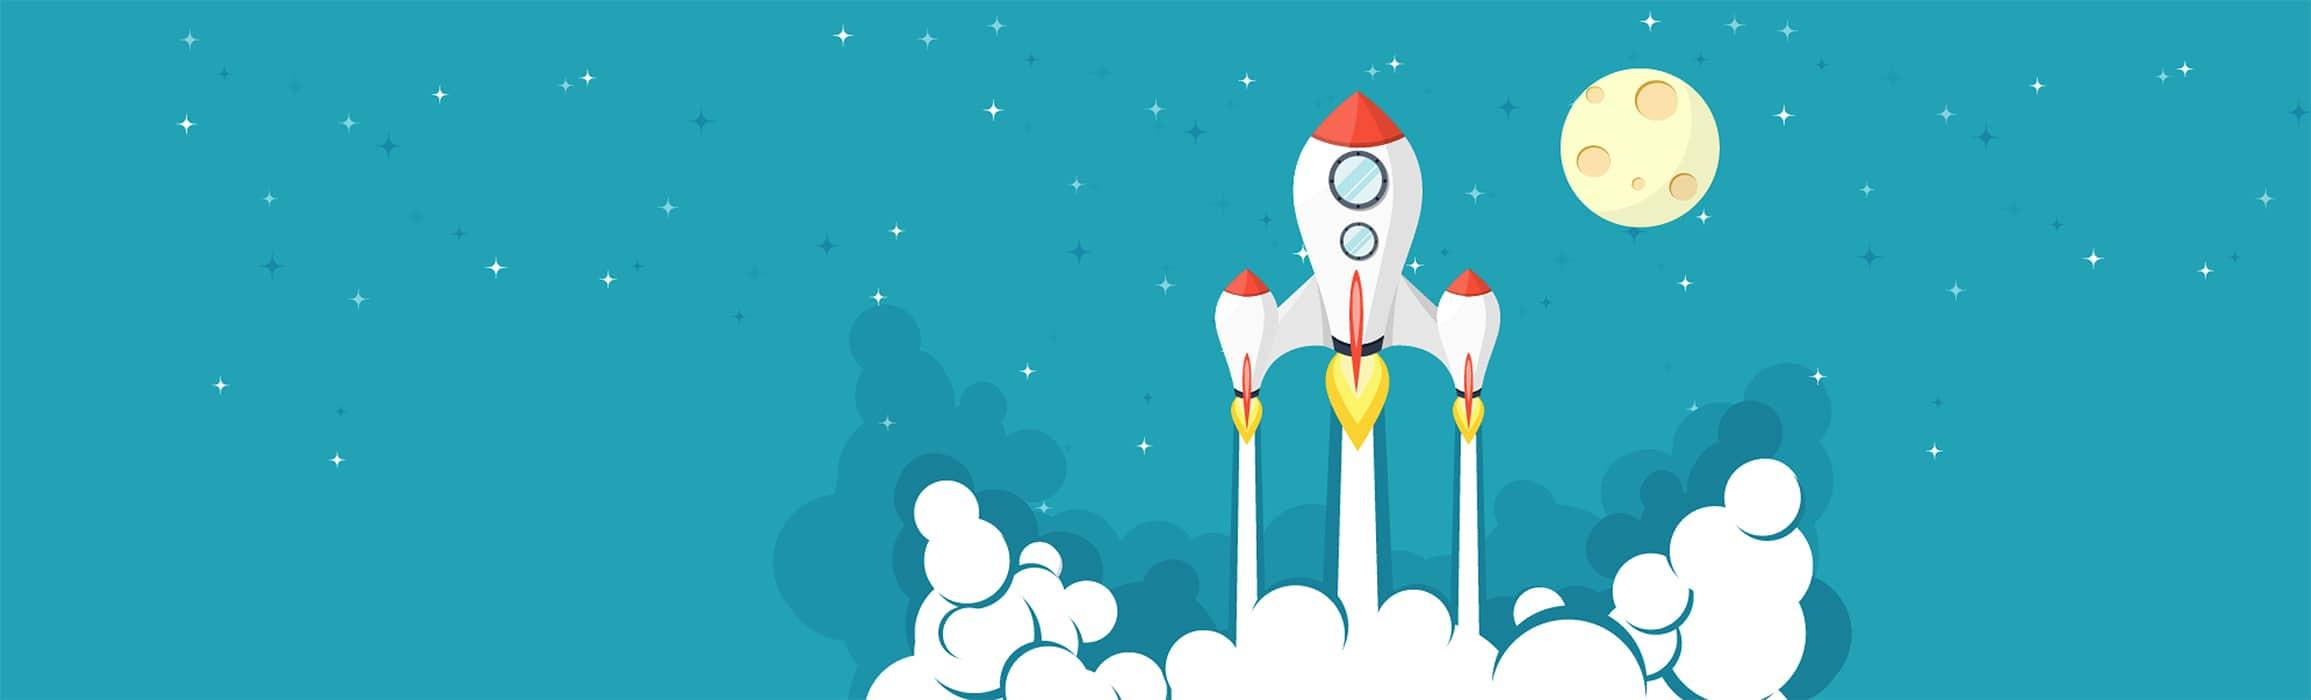 WordPress Speed Optimization Services - Improve Speed & Performance